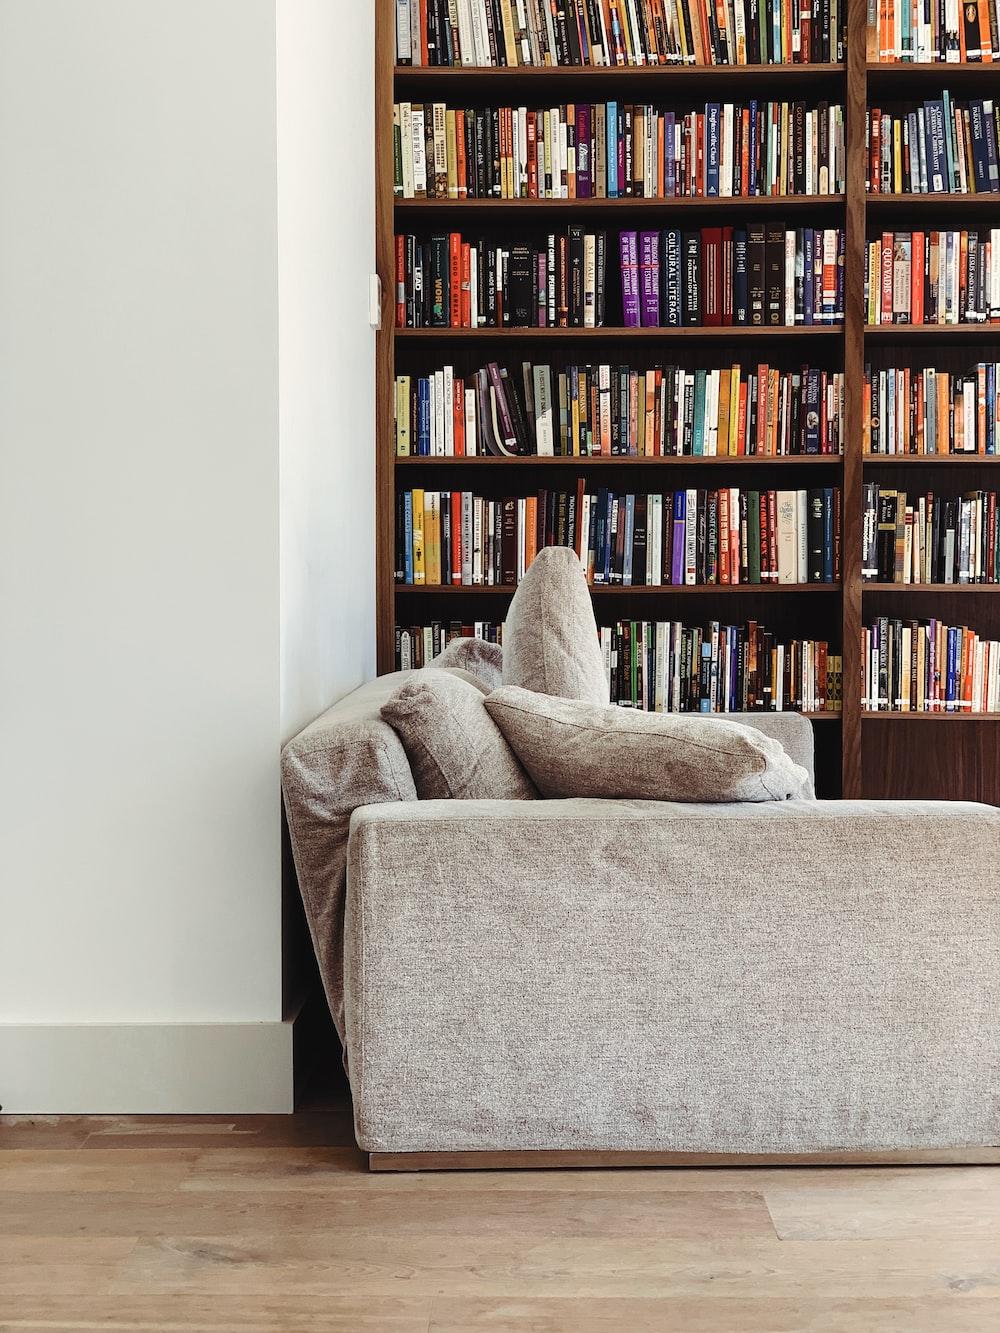 gray couch across bookshelf